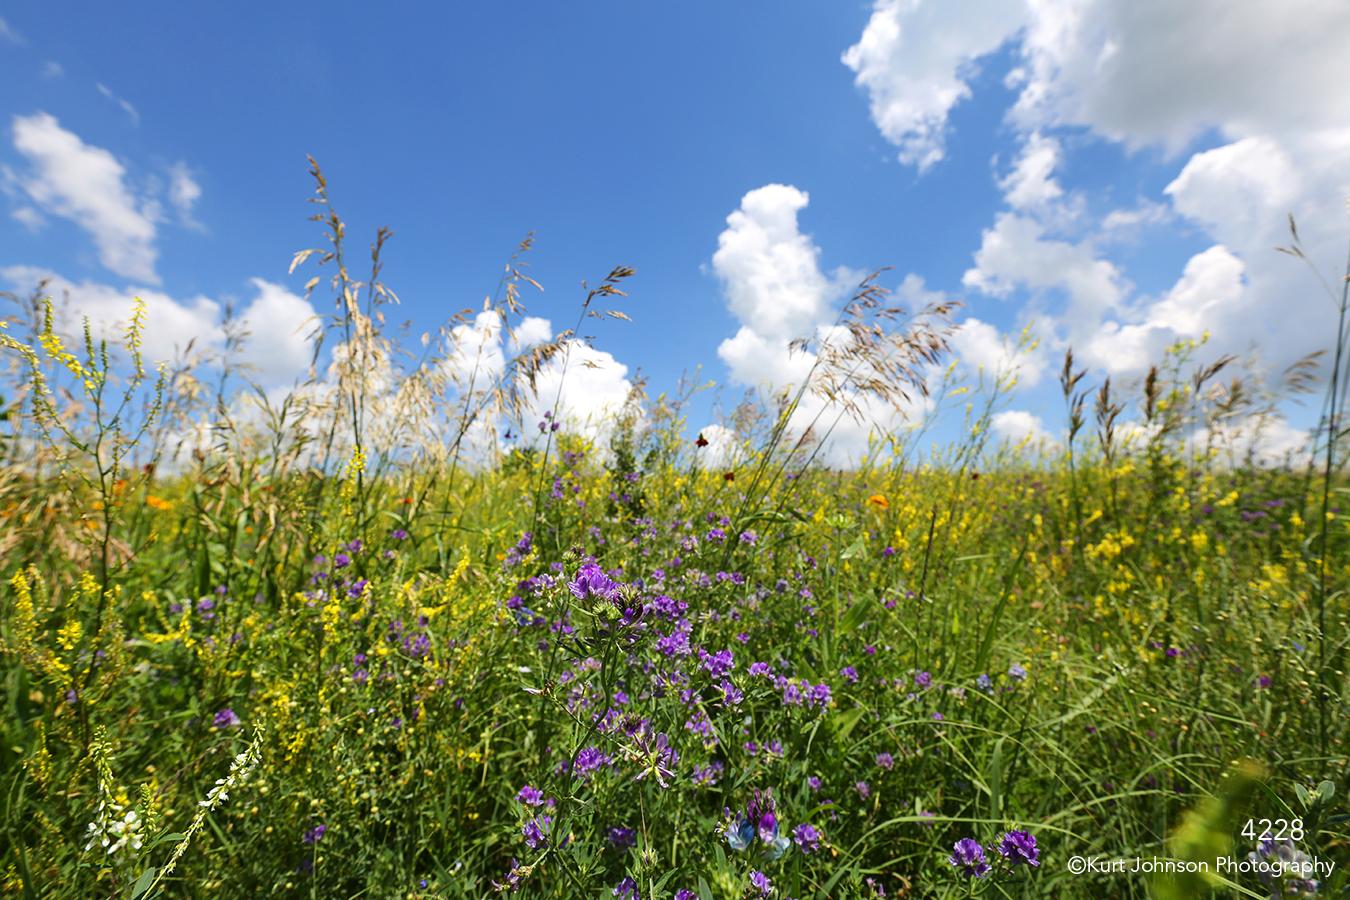 landscape grasses midwest field clouds sky green flowers purple